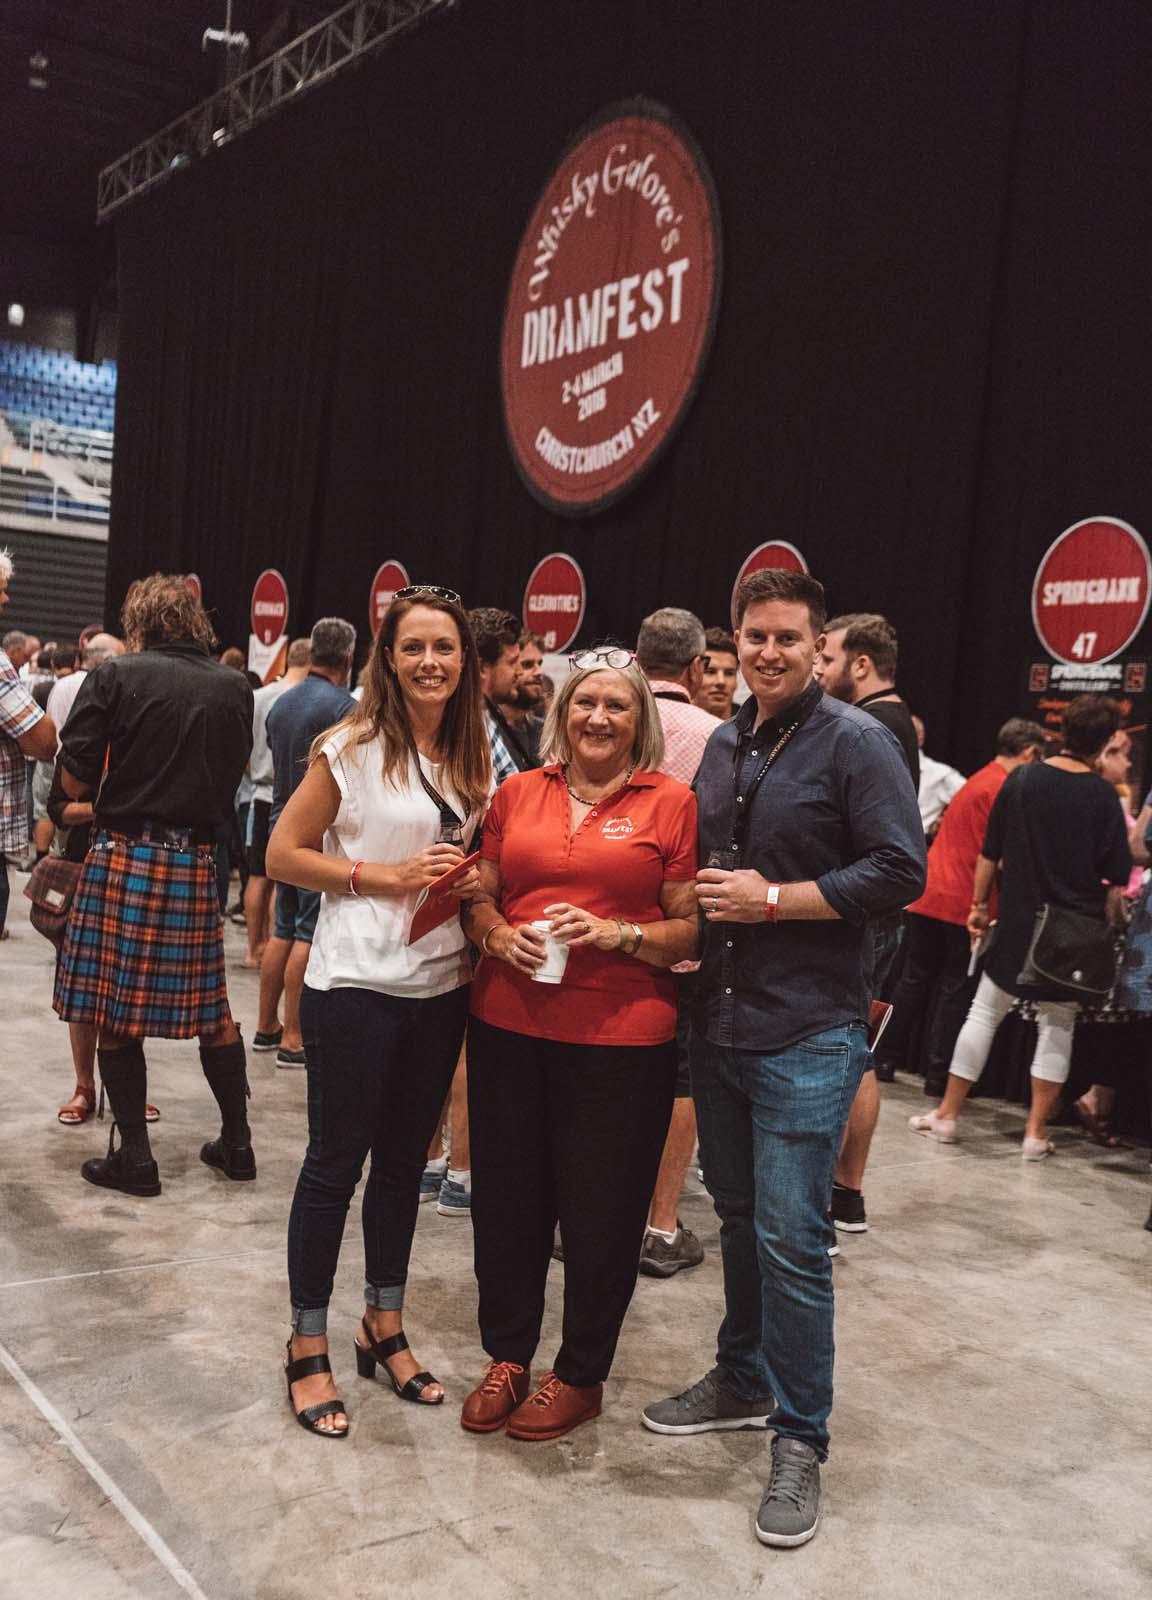 Dramfest 2018 for Whisky Galore-336.jpg